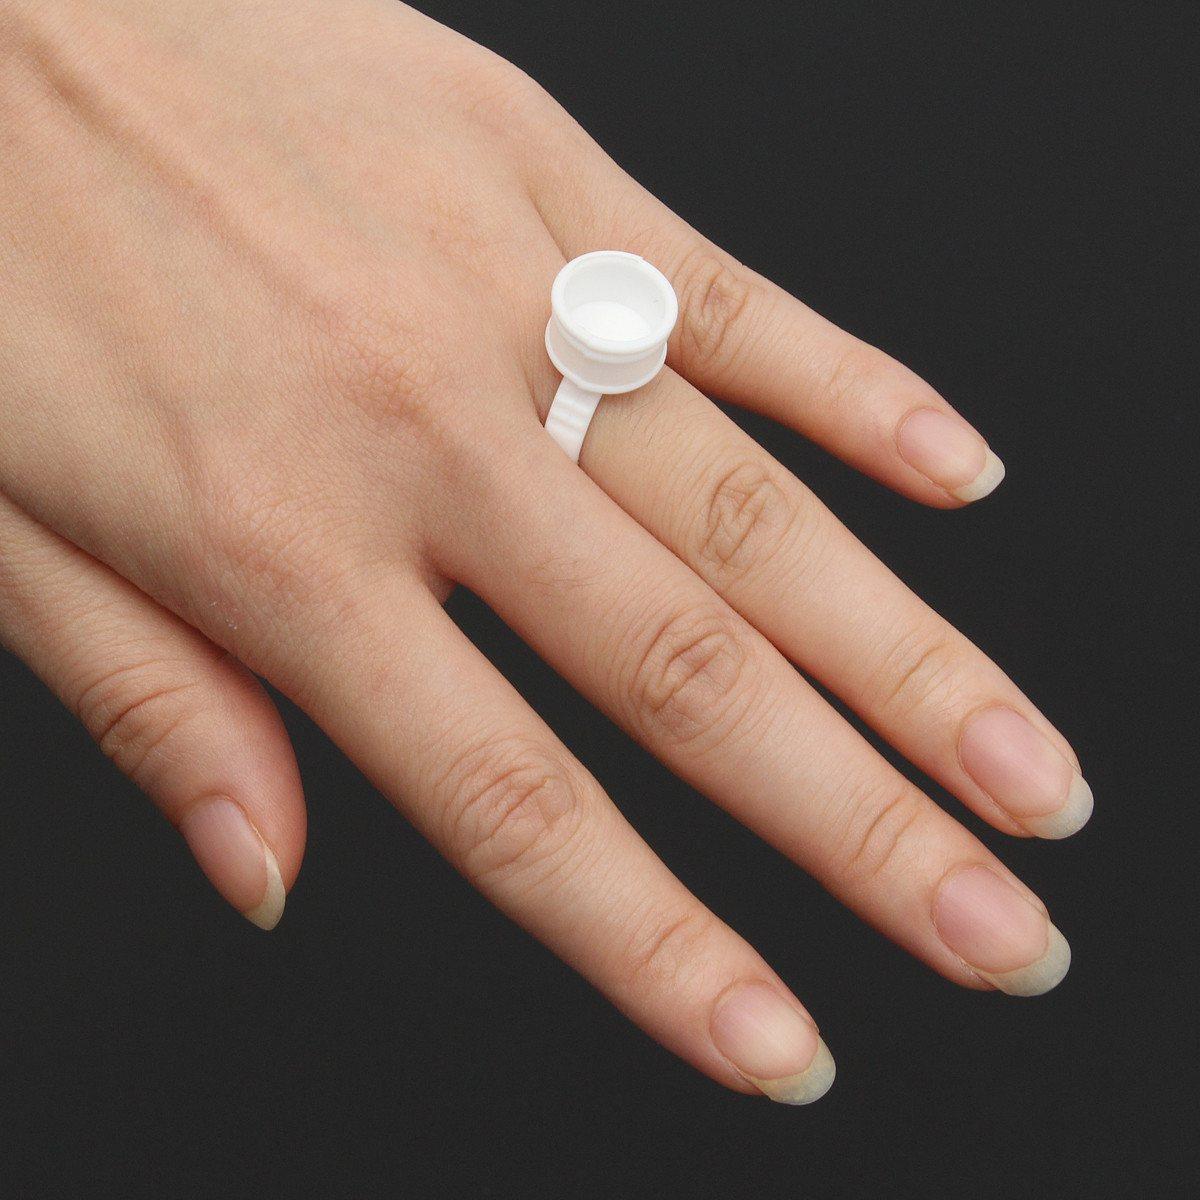 White /Bag Medium Size Disposable Permanent Makeup Ring Partition ...